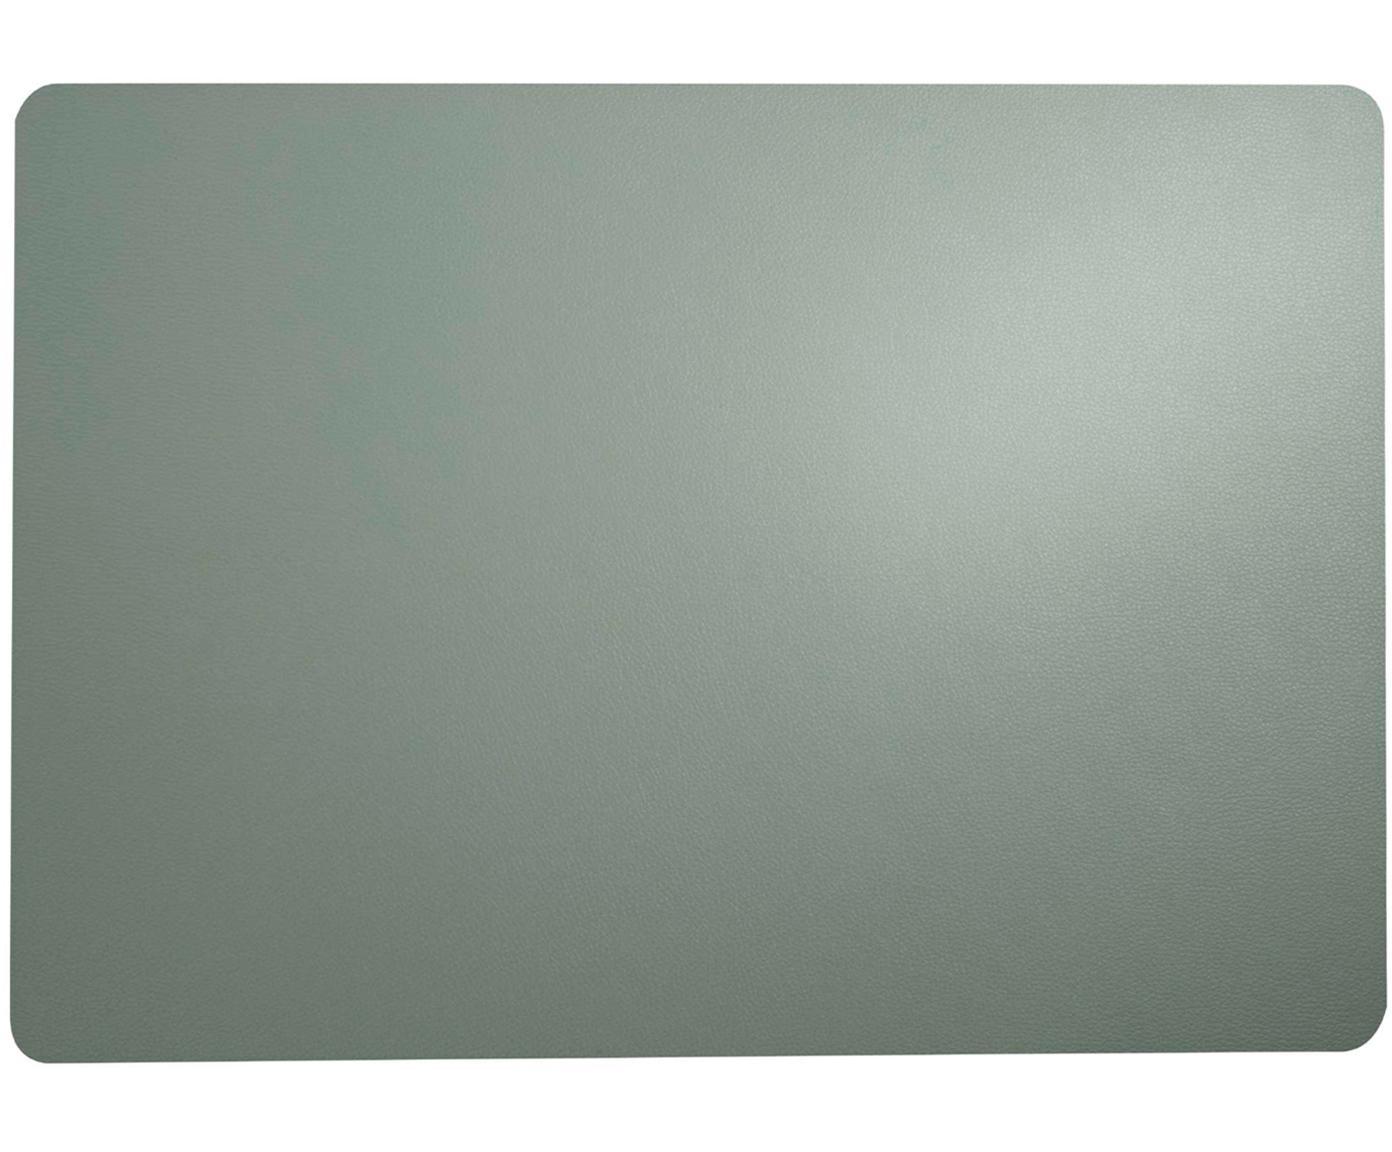 Kunstleder-Tischsets Pik, 2 Stück, Kunstleder (PVC), Mintgrün, 33 x 46 cm